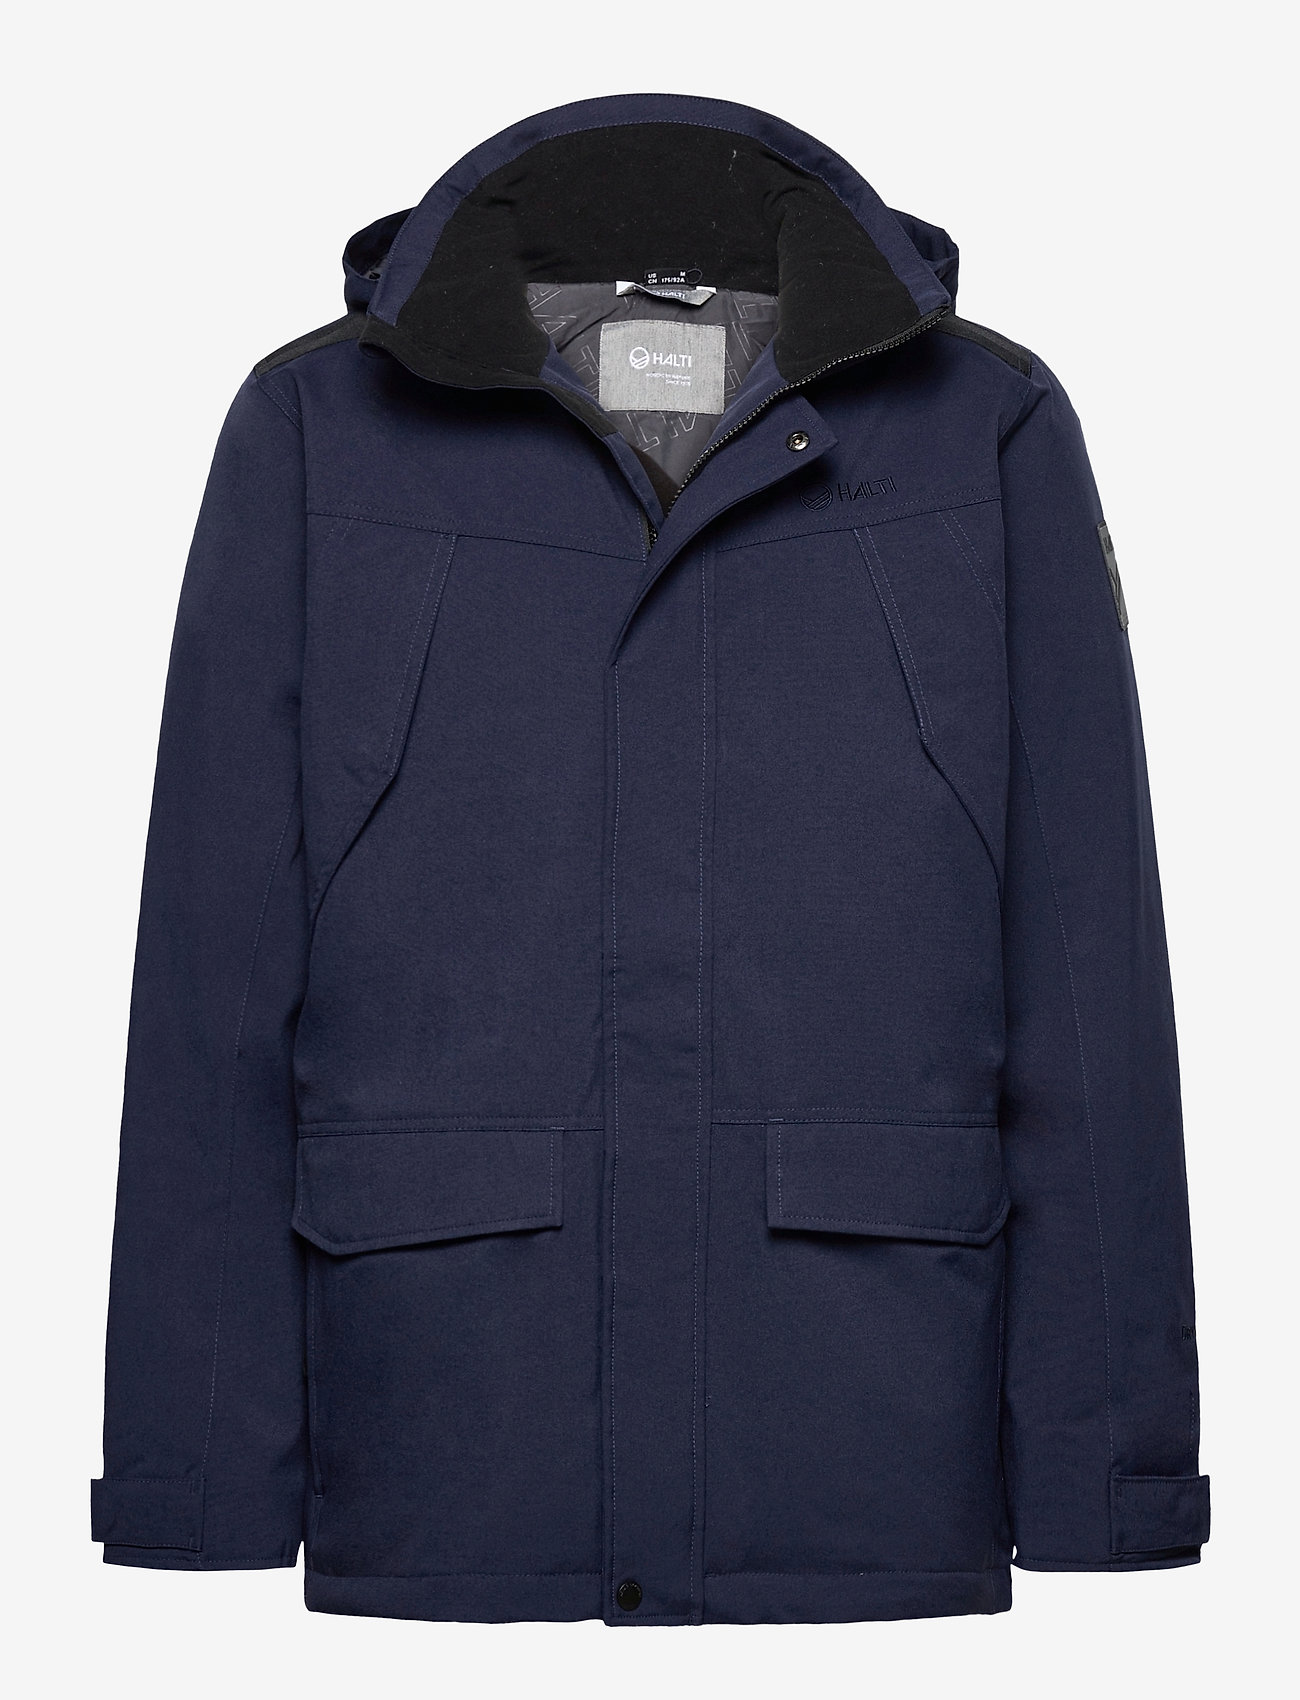 Halti - Luosto Men's Warm parka jacket - parkas - peacoat blue - 0